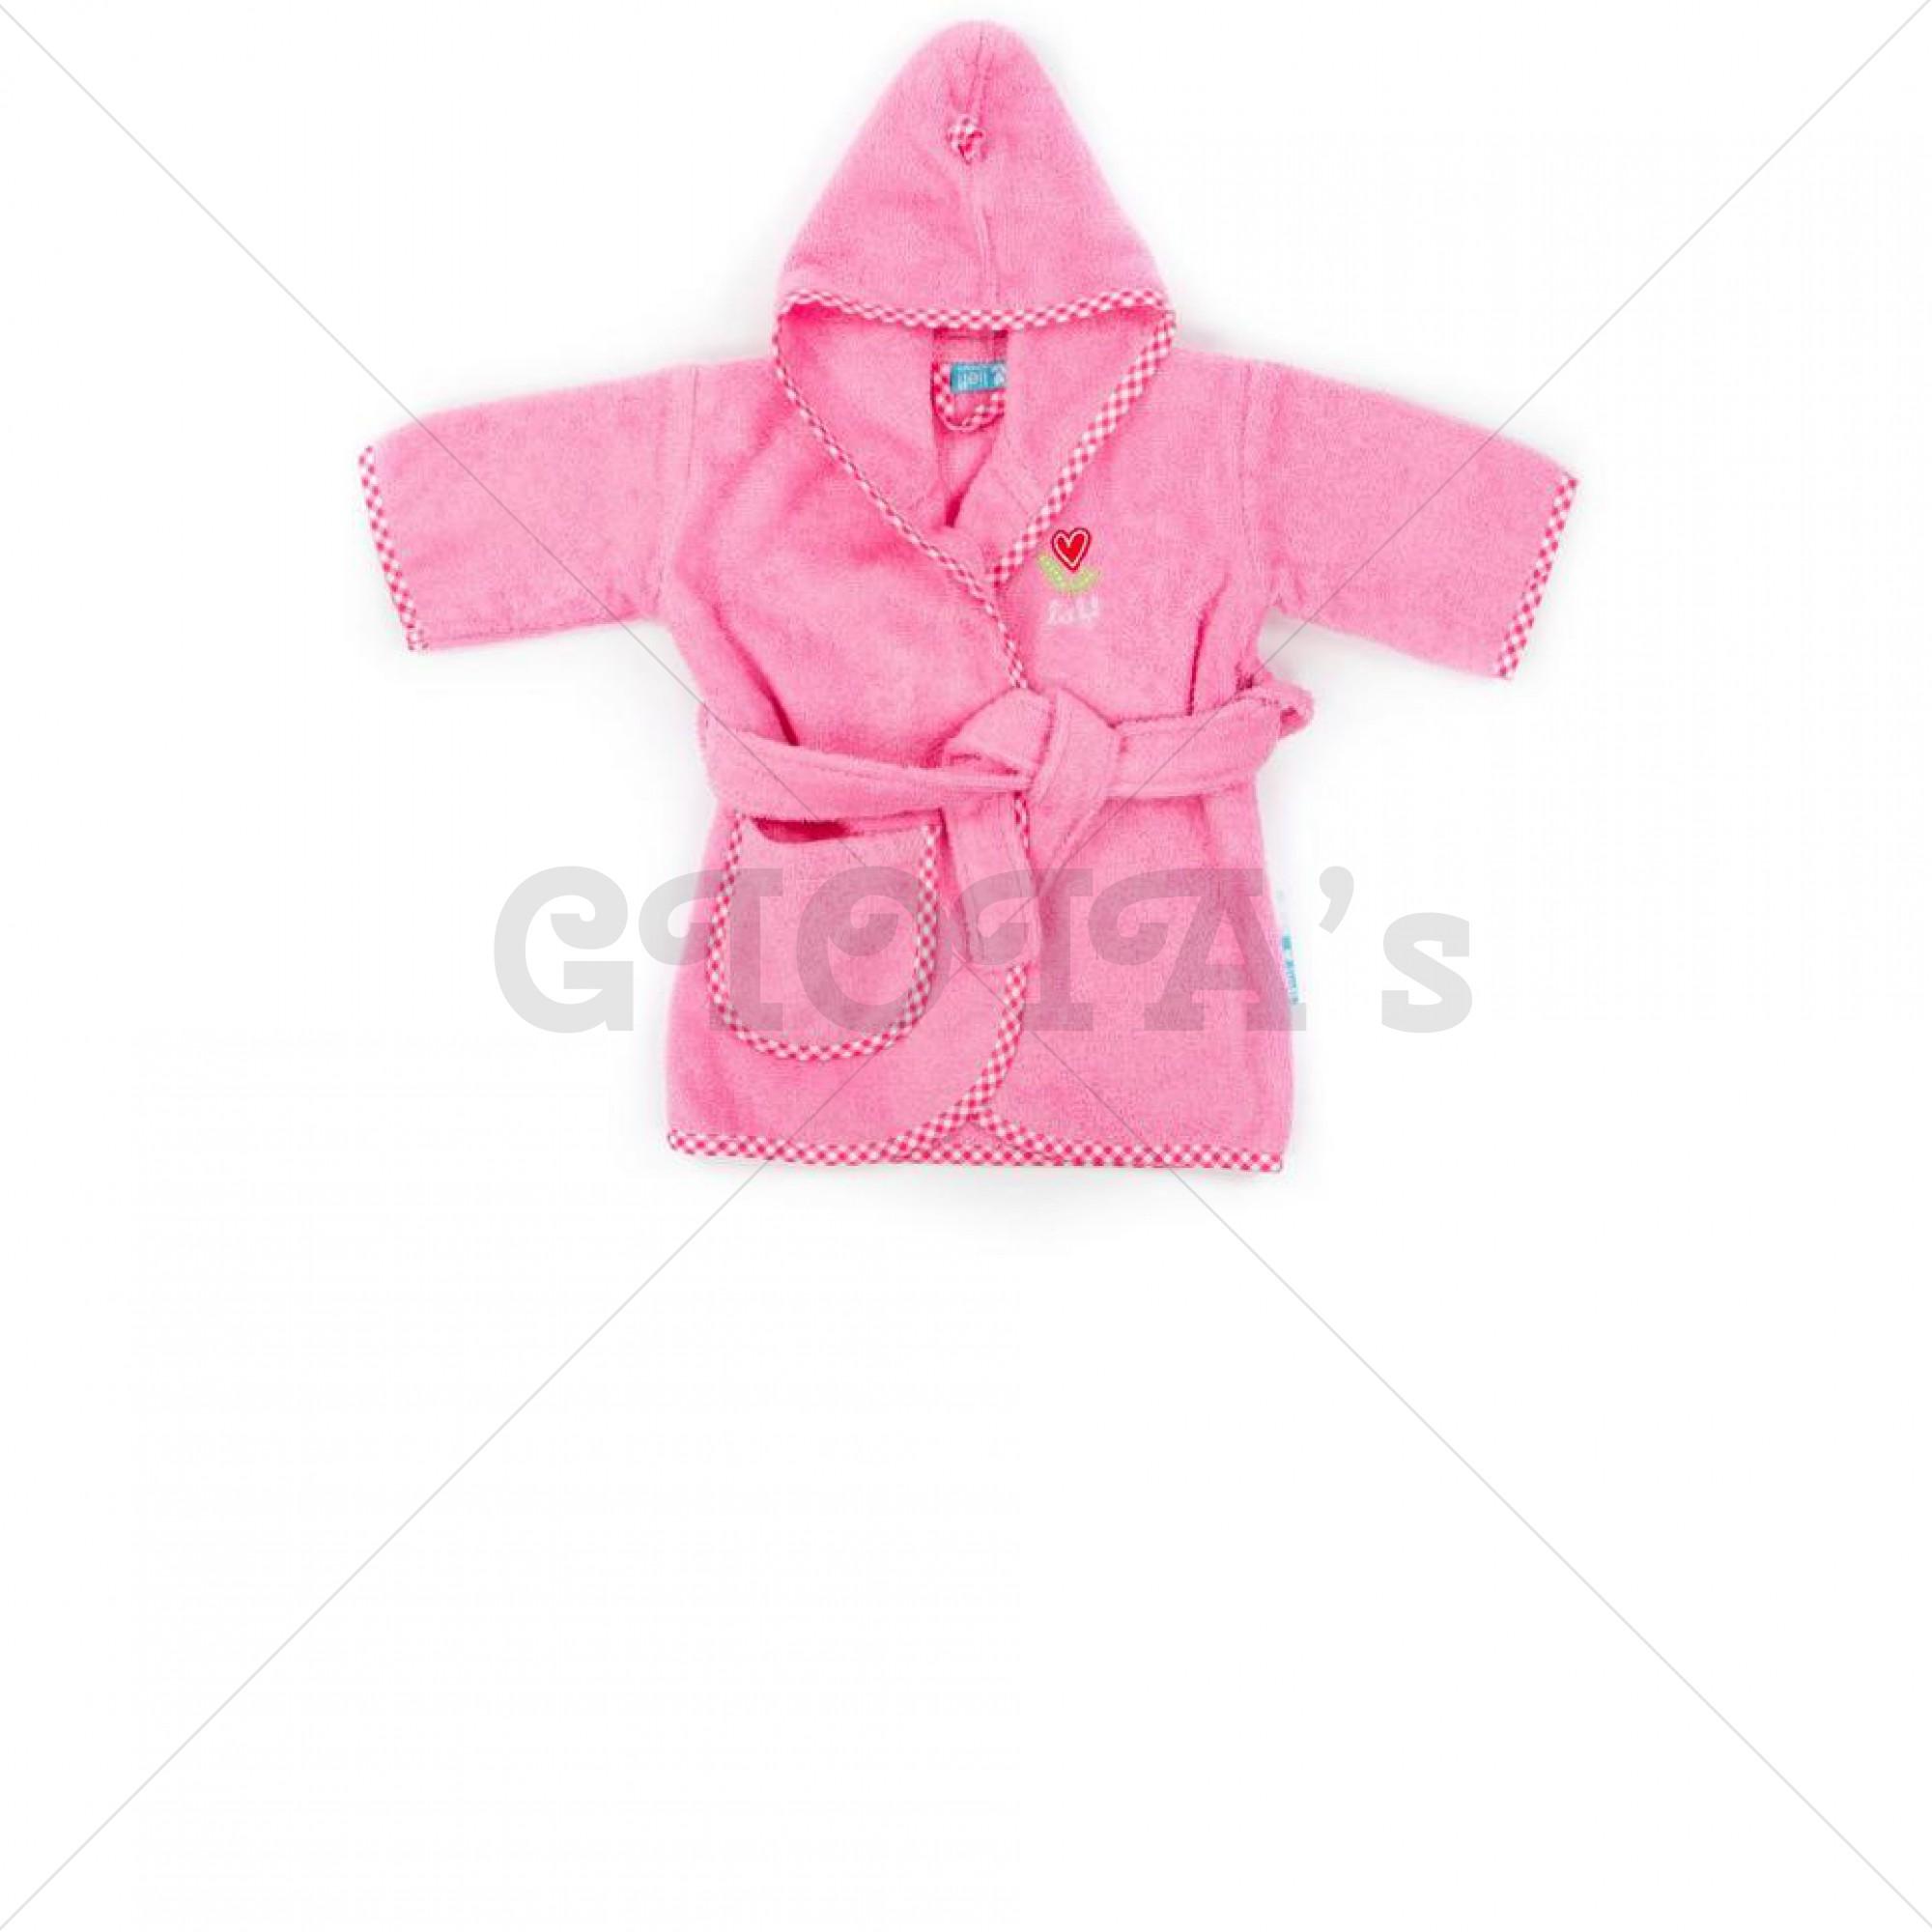 9f4bb48cc85 Lief! lifestyle badjas lichtroze 1 - 2 jaar - GIOIA's cadeau en ...